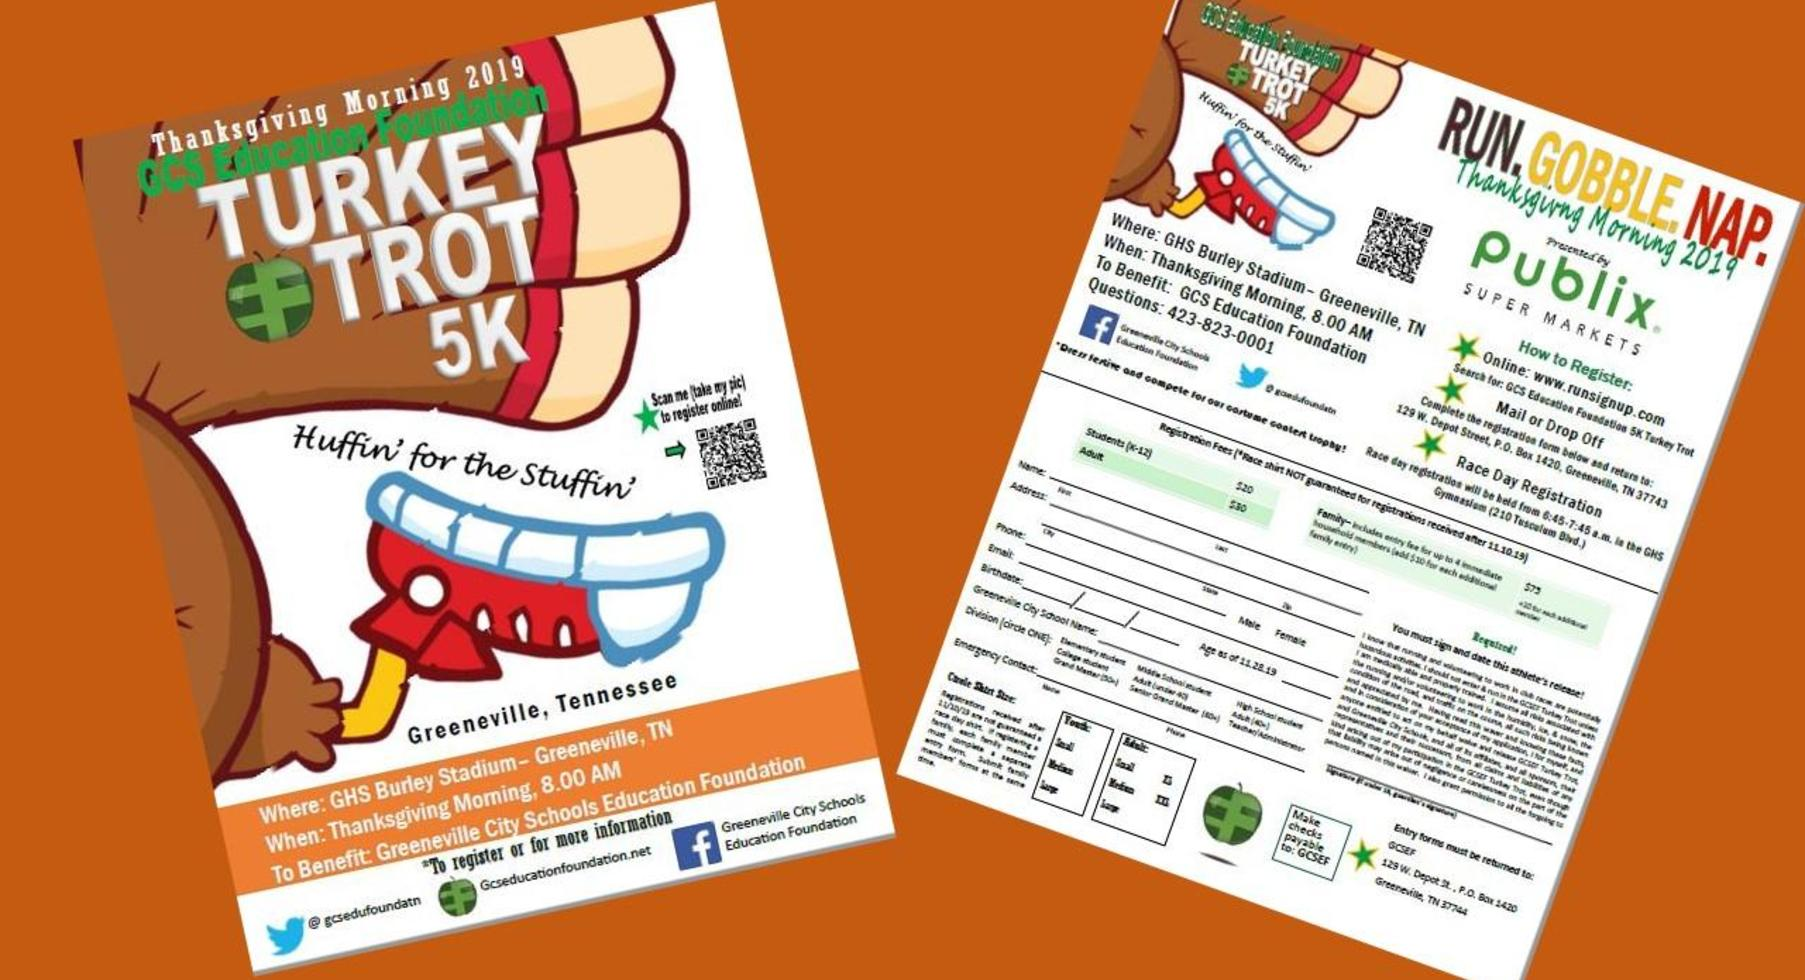 Turkey Trot Information